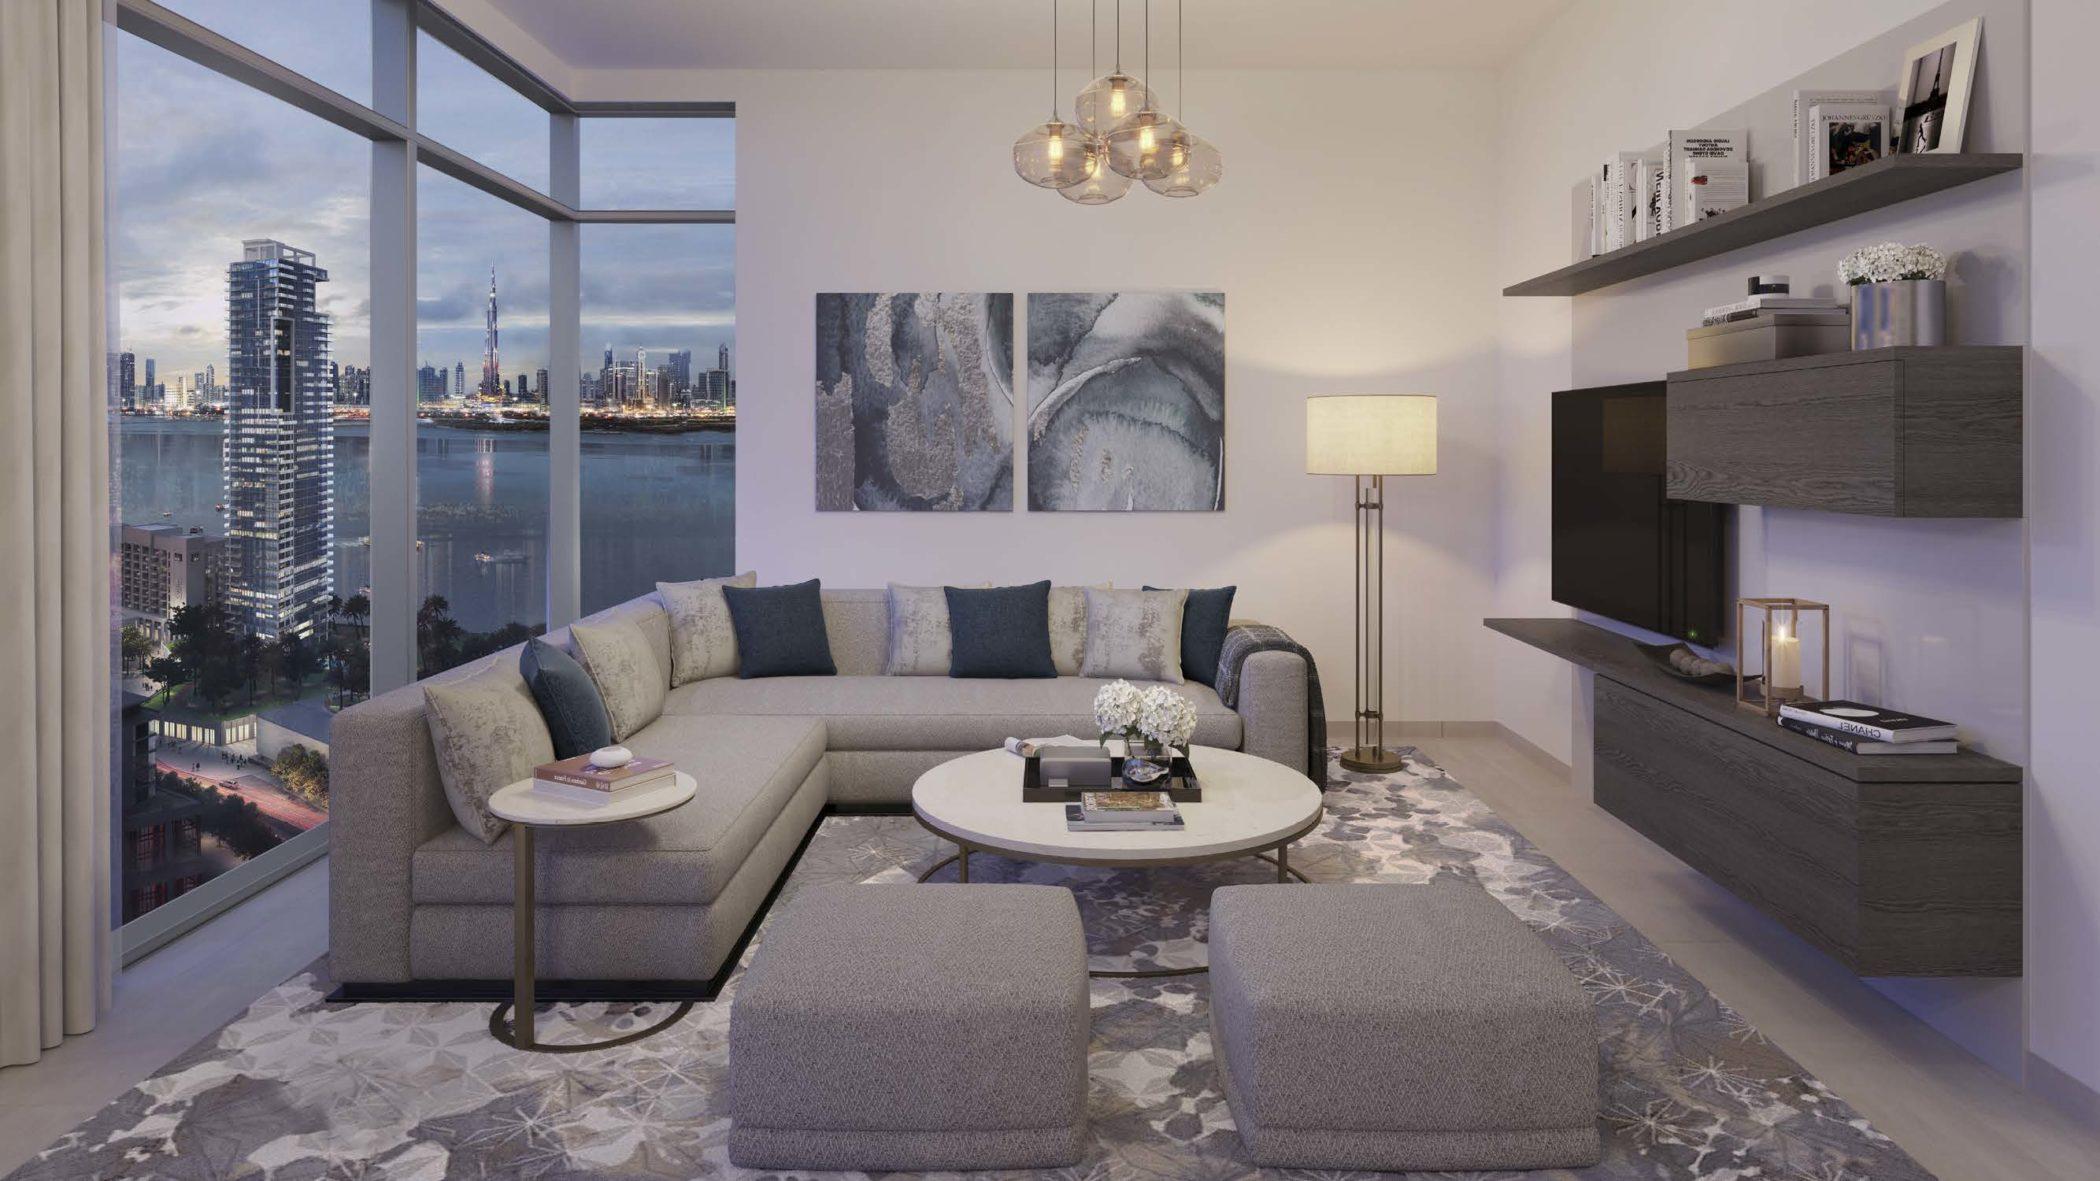 Creek Rise by Emaar in Dubai Creek Harbour. Luxury apartments for sale in Dubai._2